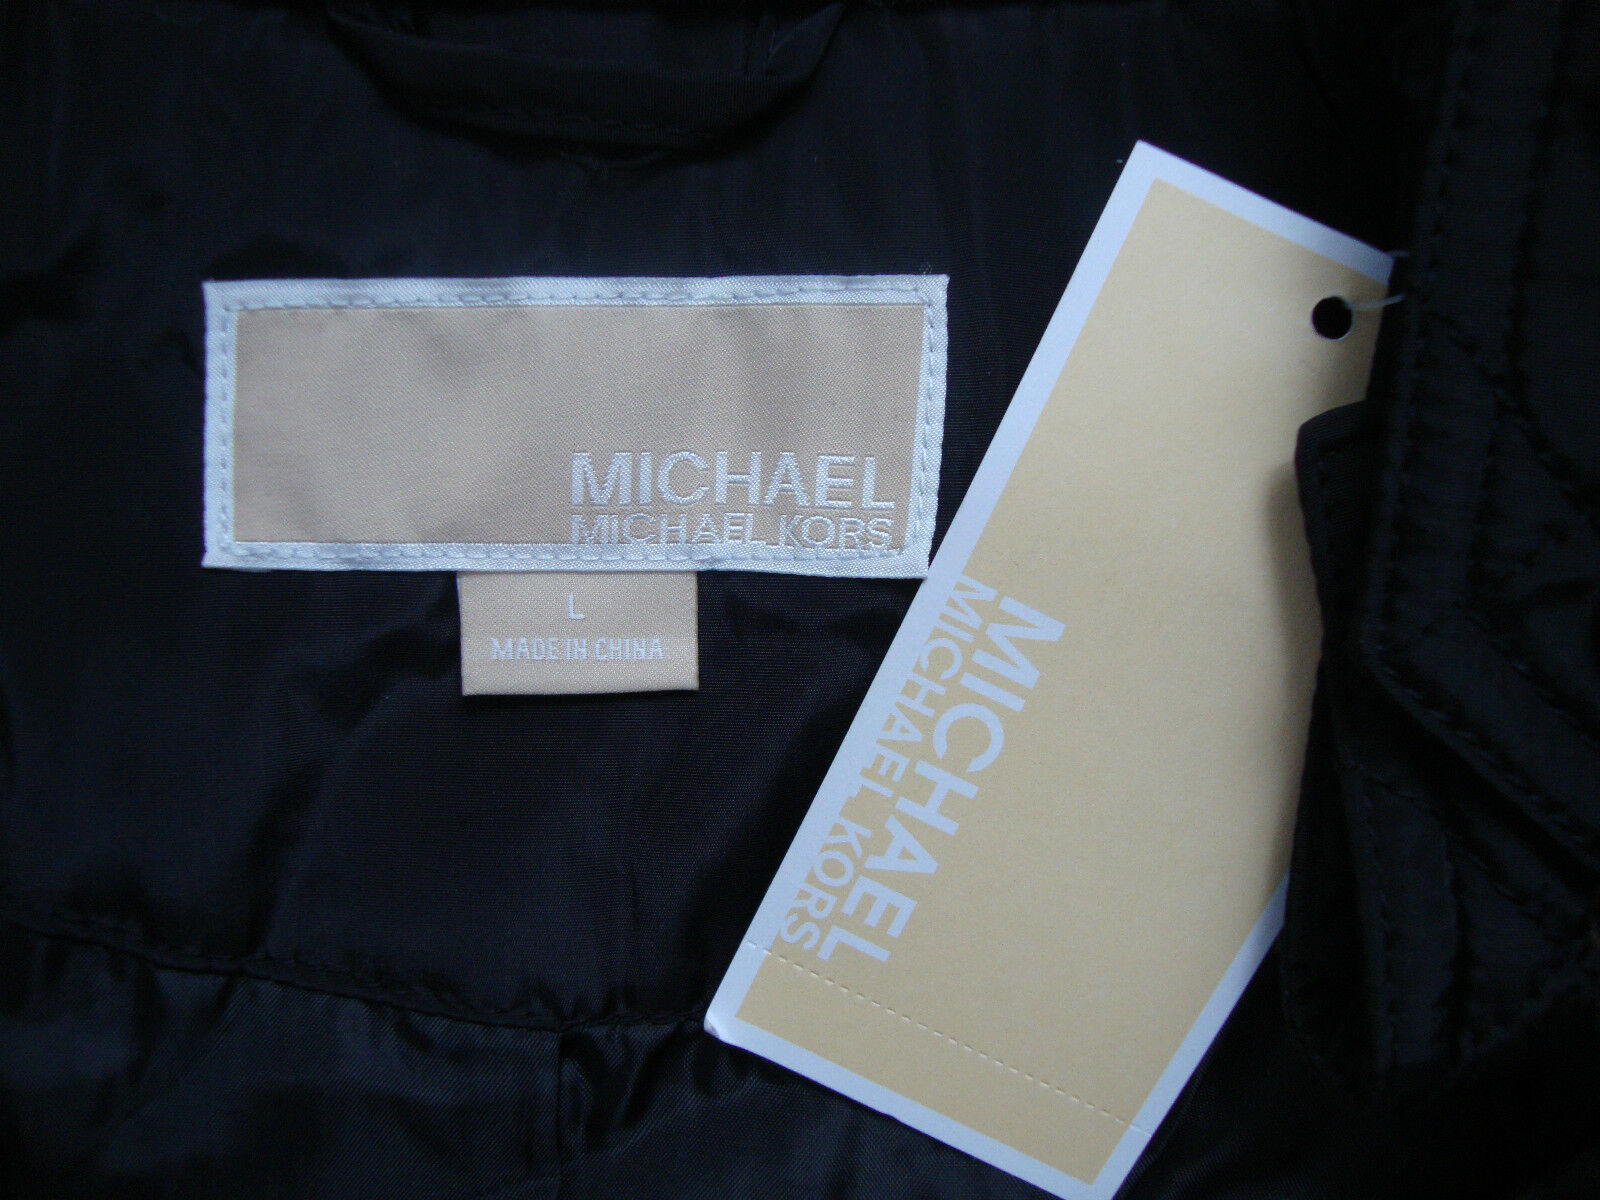 michael kors jacke damen steppjacke bergangsjacke schwarz gr l neu mit etikett eur 159 99. Black Bedroom Furniture Sets. Home Design Ideas